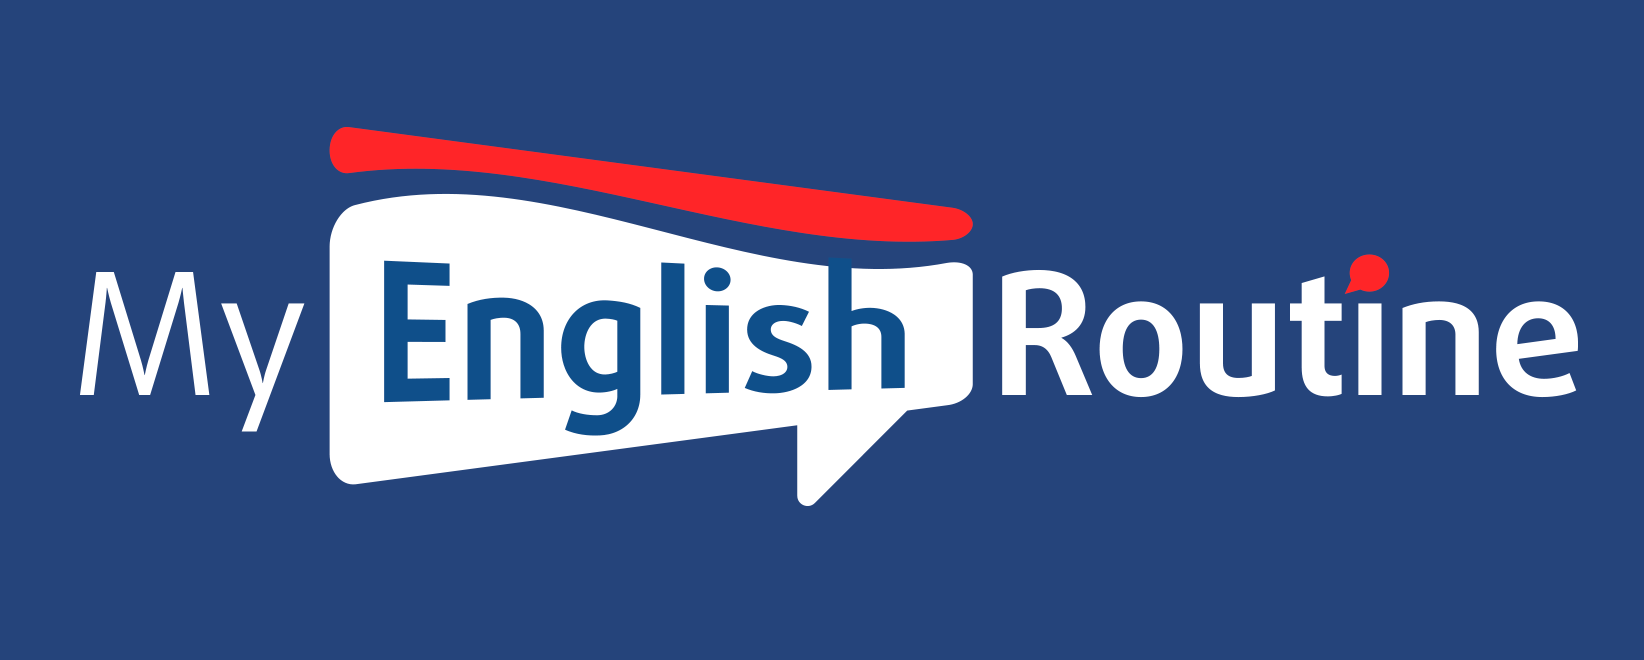 My English Routine